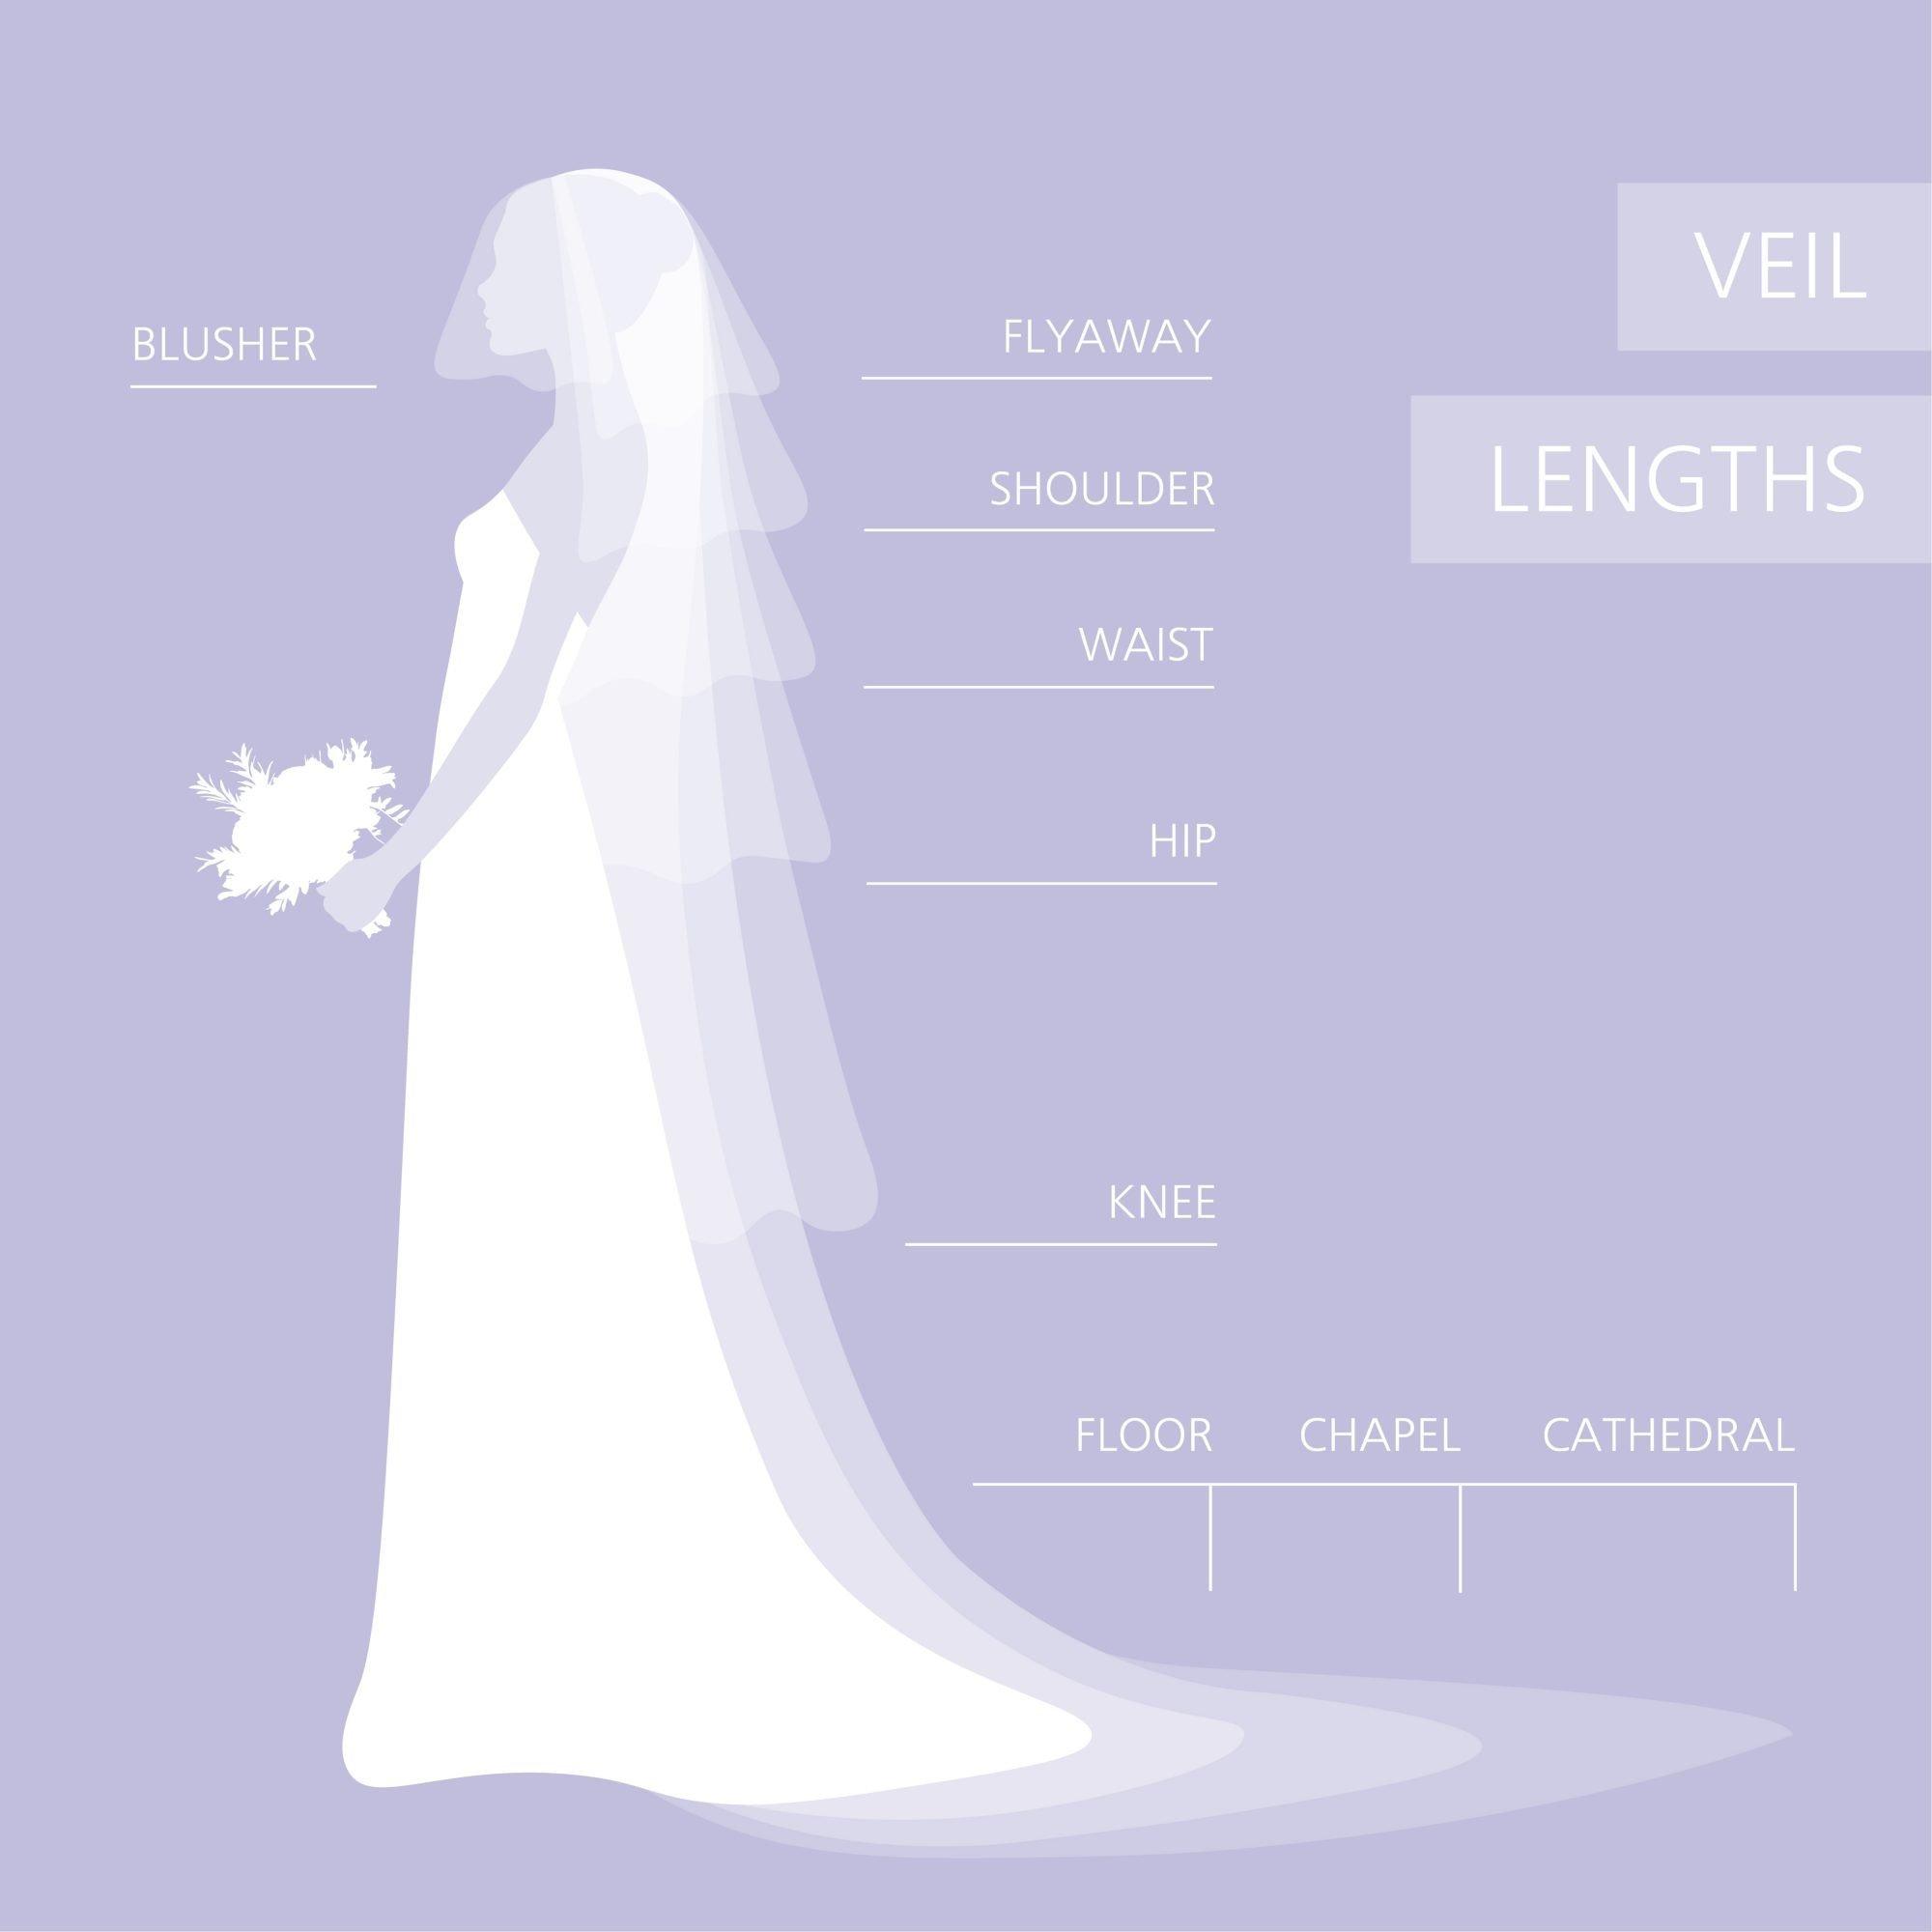 wedding veil length and style chart